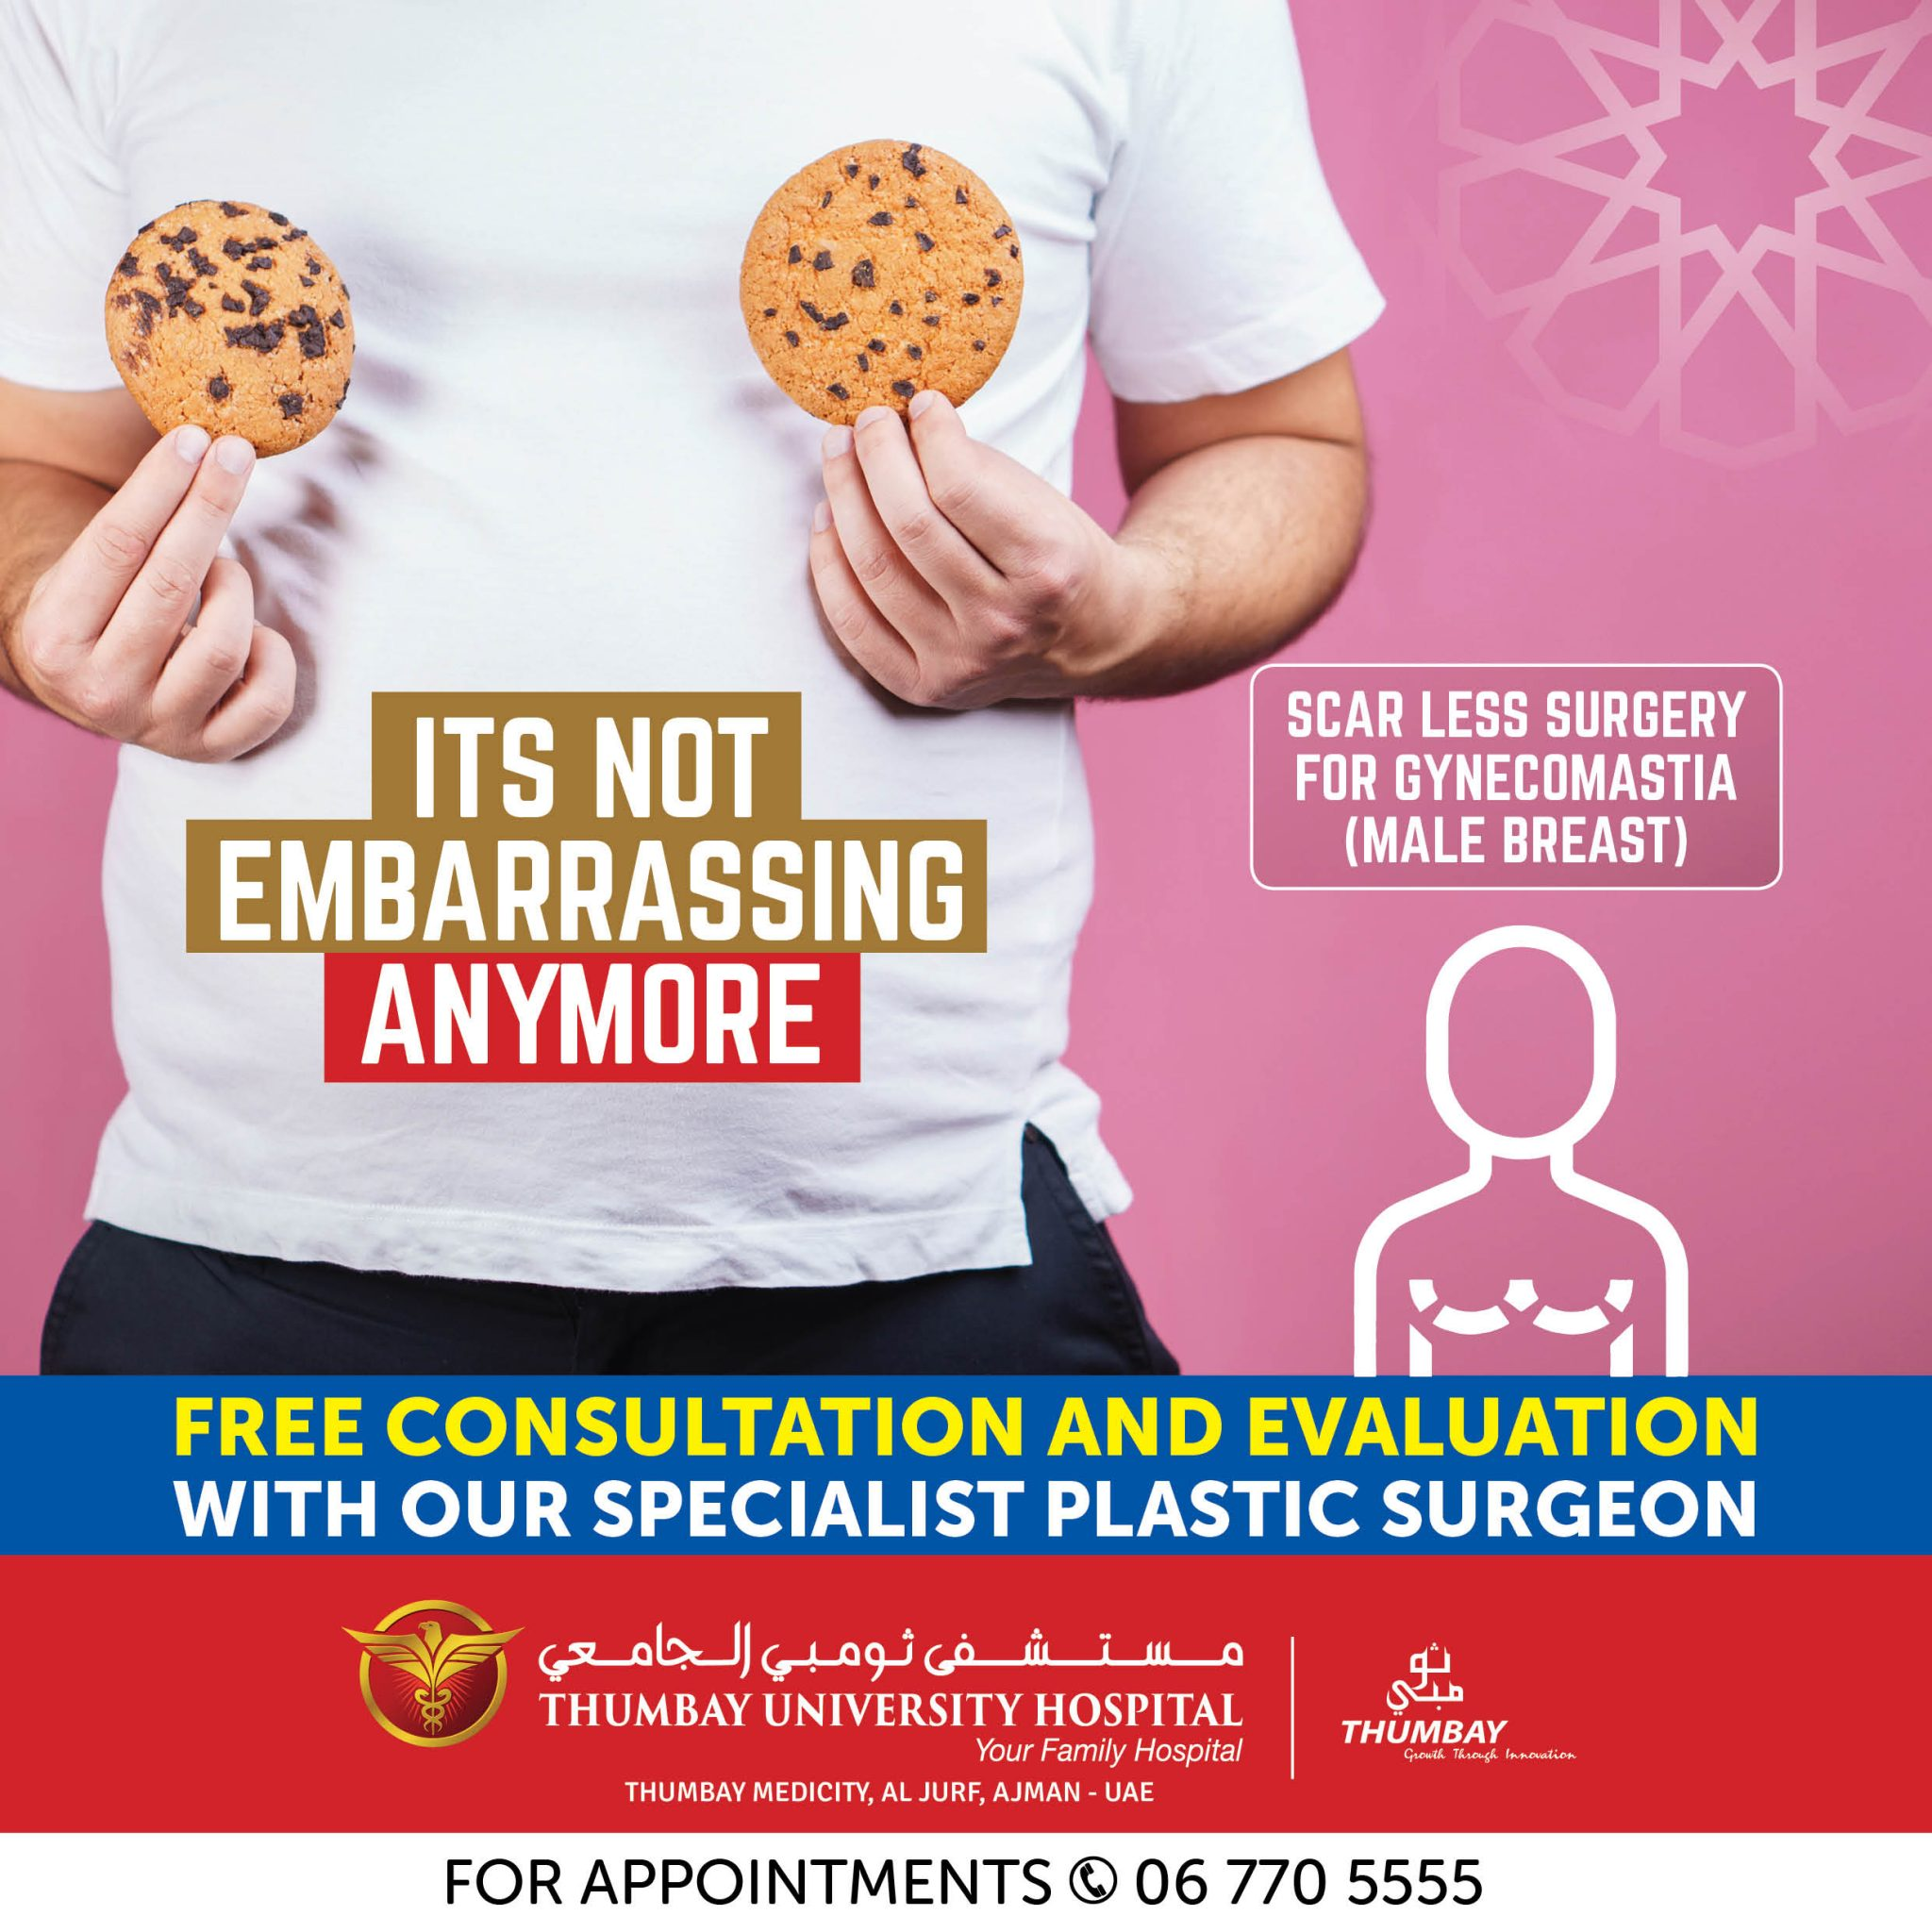 Scar Less Surgery for Gynecomastia (Male Breast)